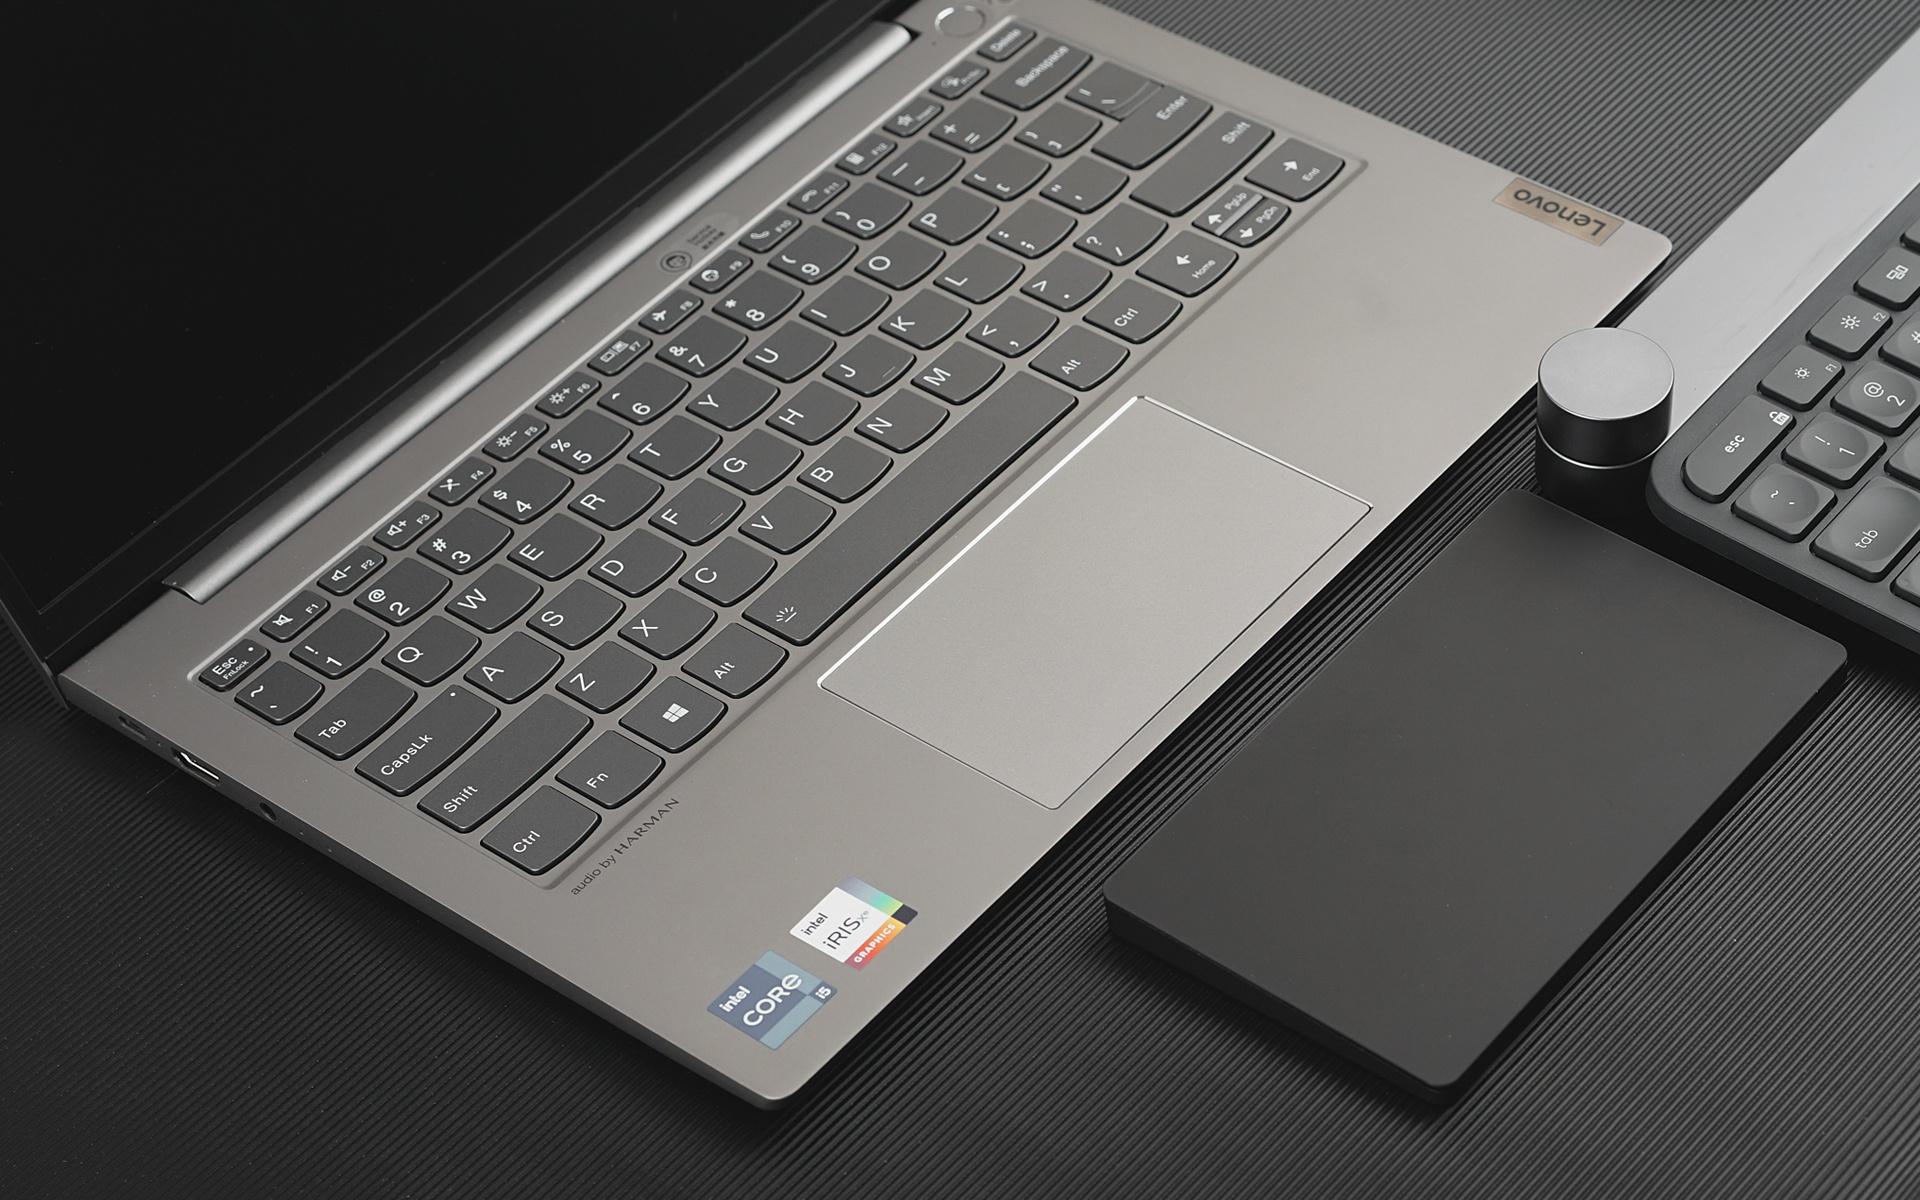 BRYDGE W-Touch触控板体验:告别鼠标手轻办公利器